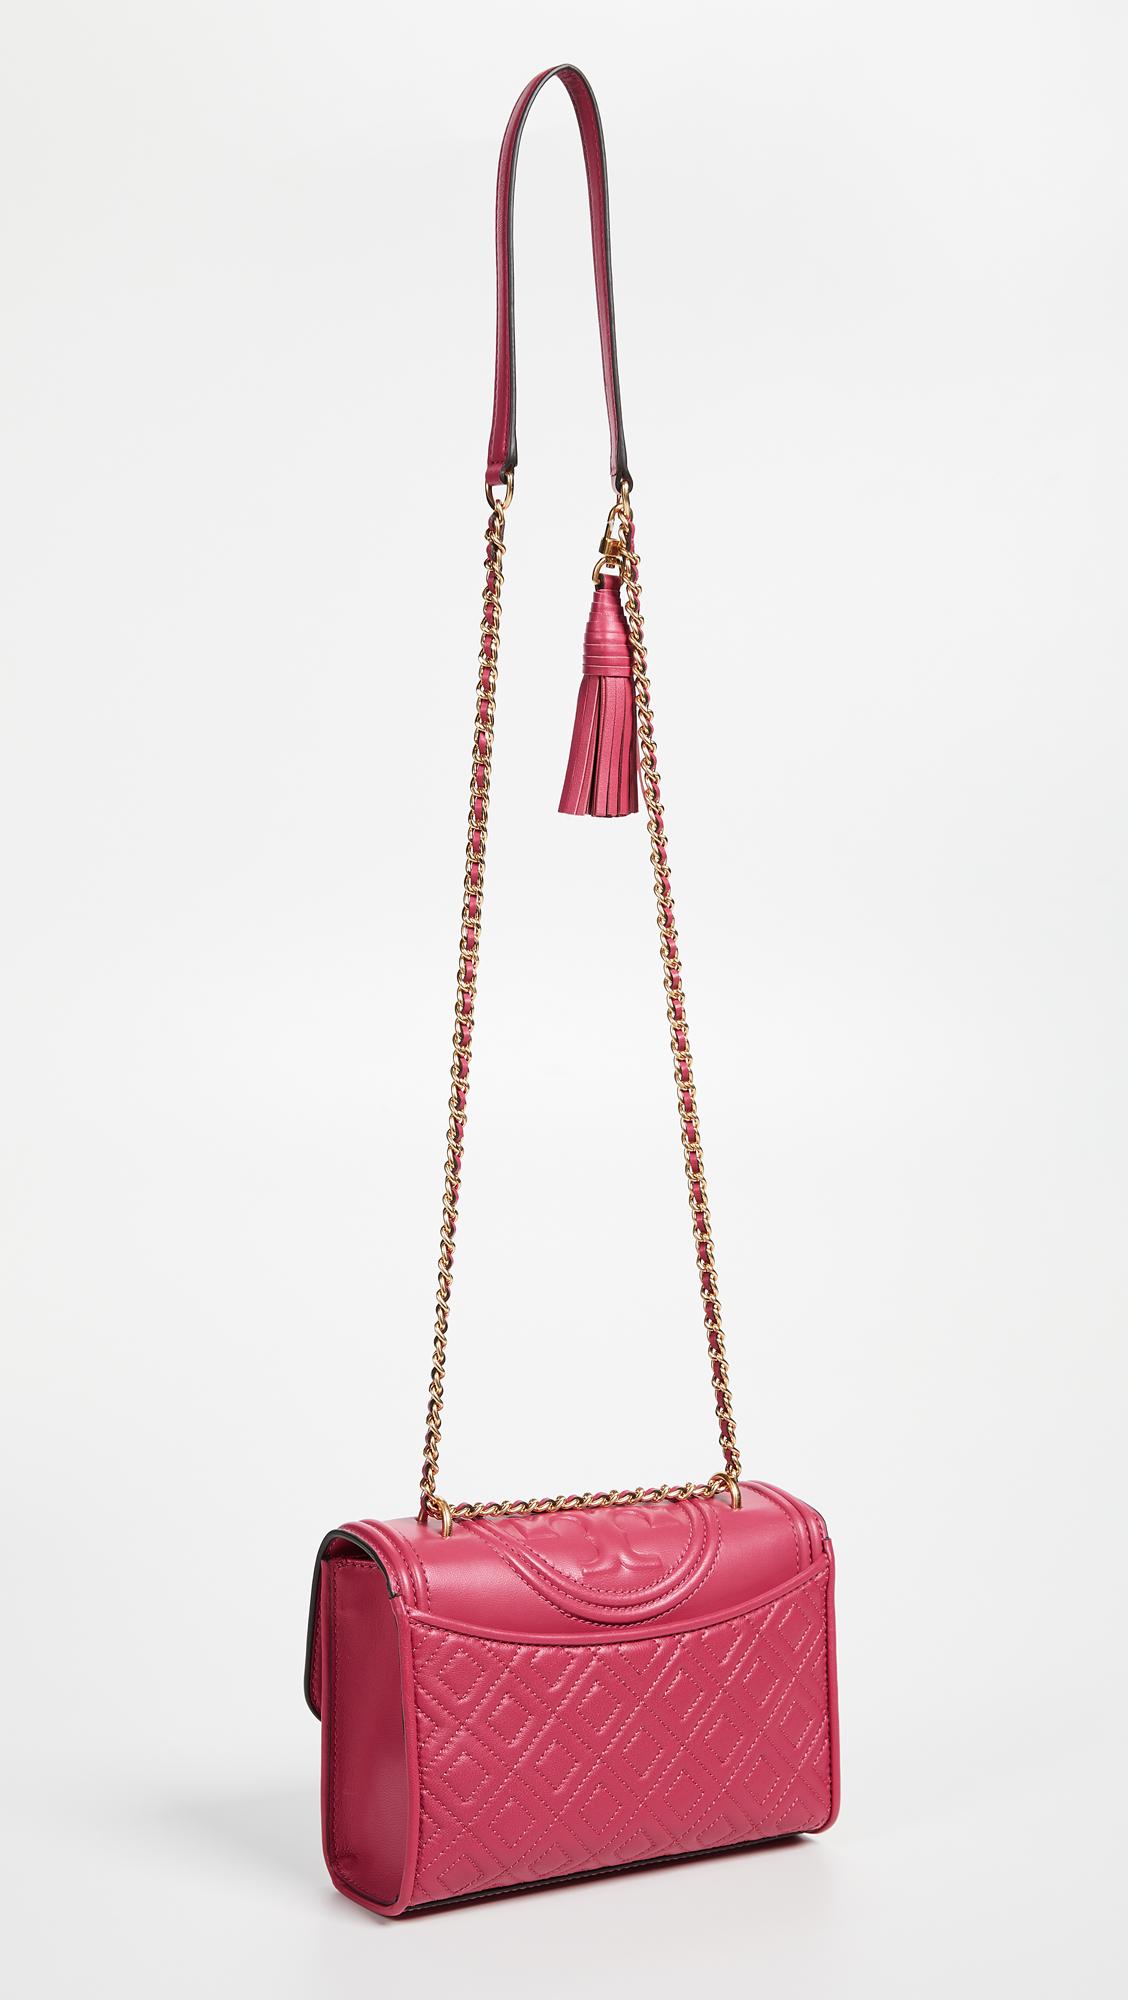 85dde9ee969ed Tory Burch Fleming Small Convertible Shoulder Bag